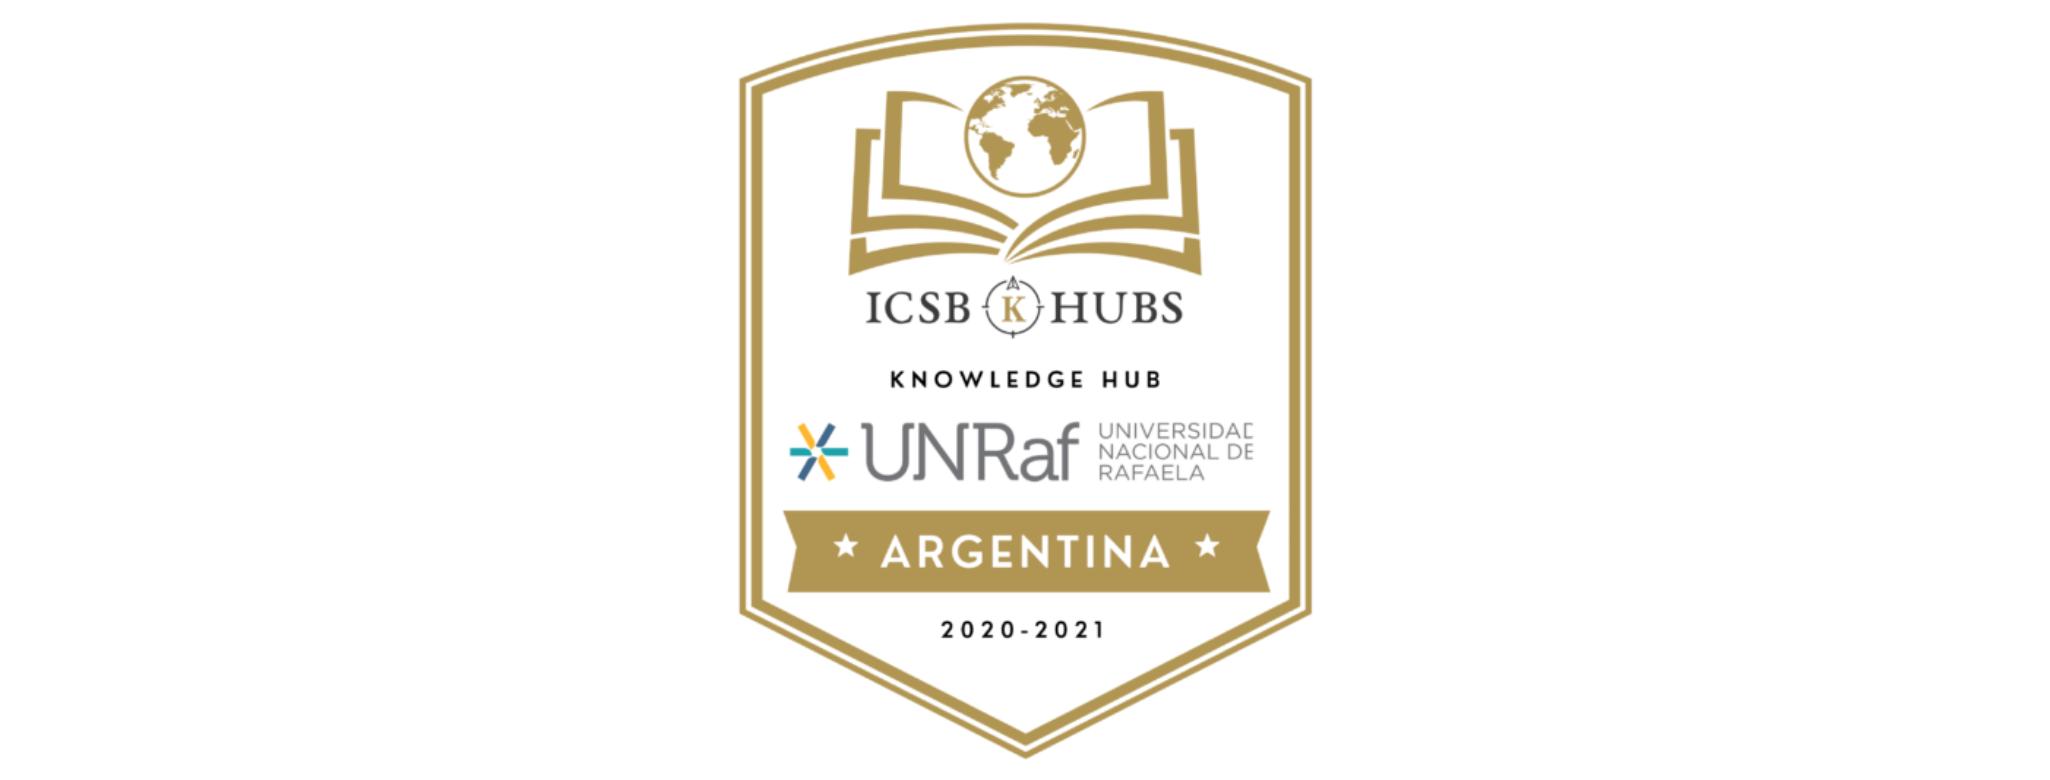 UNRAF ICSB KHUB